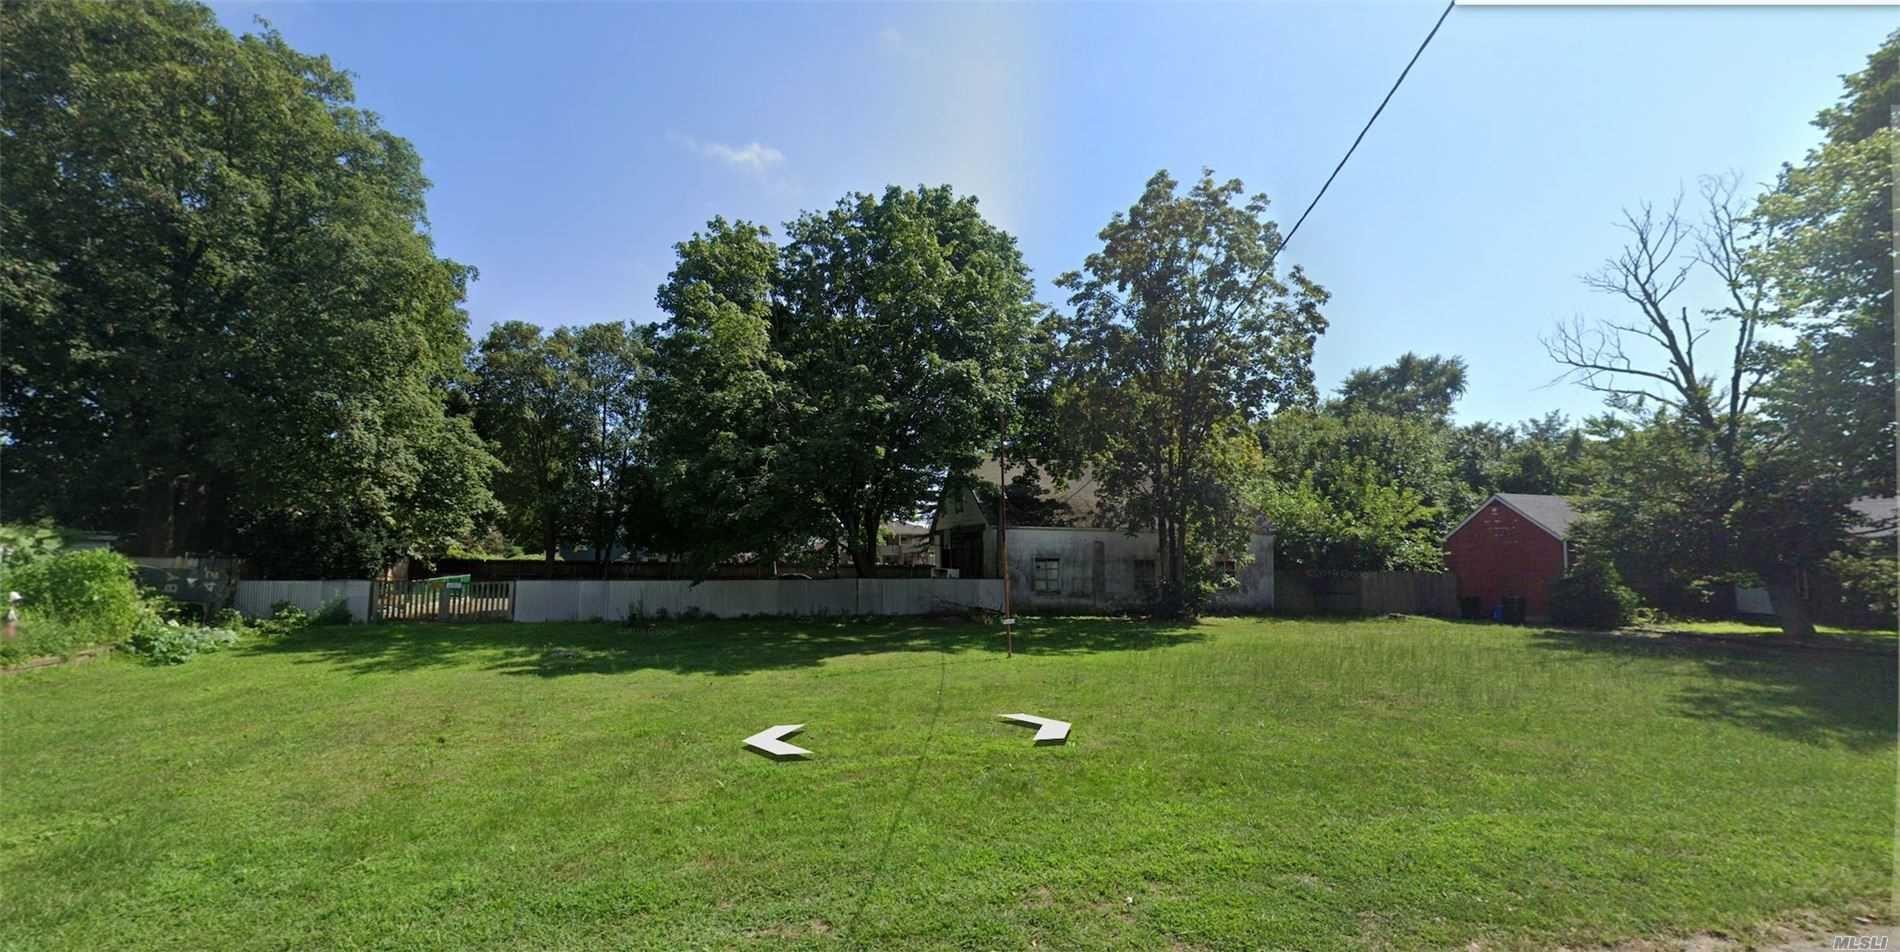 384 Scudder Avenue, Copiague, NY 11726 - MLS#: 3247158